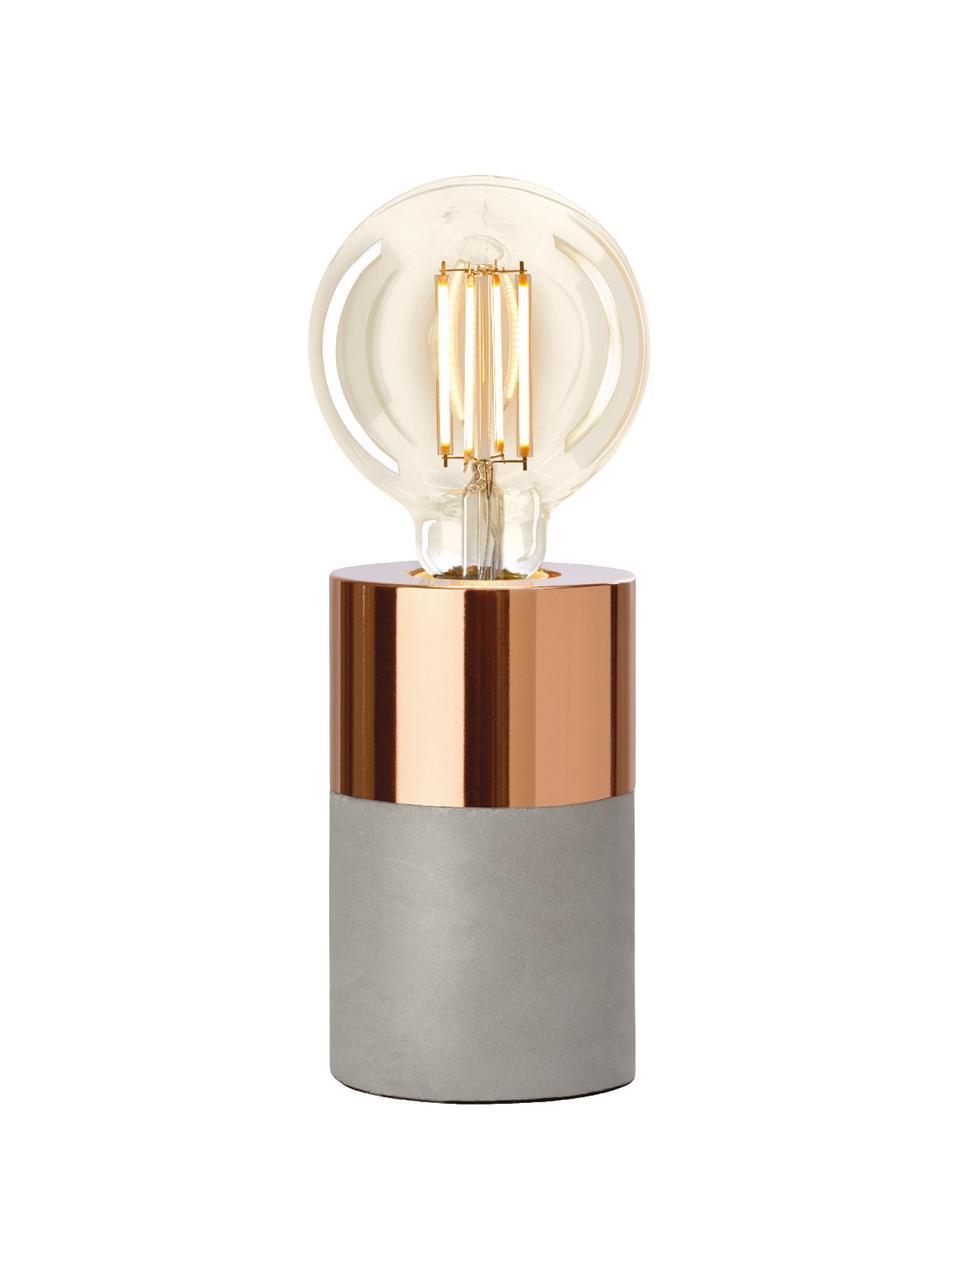 Kleine betonnen tafellamp Athene, Grijs, koperkleurig, Ø 8 x H 14 cm